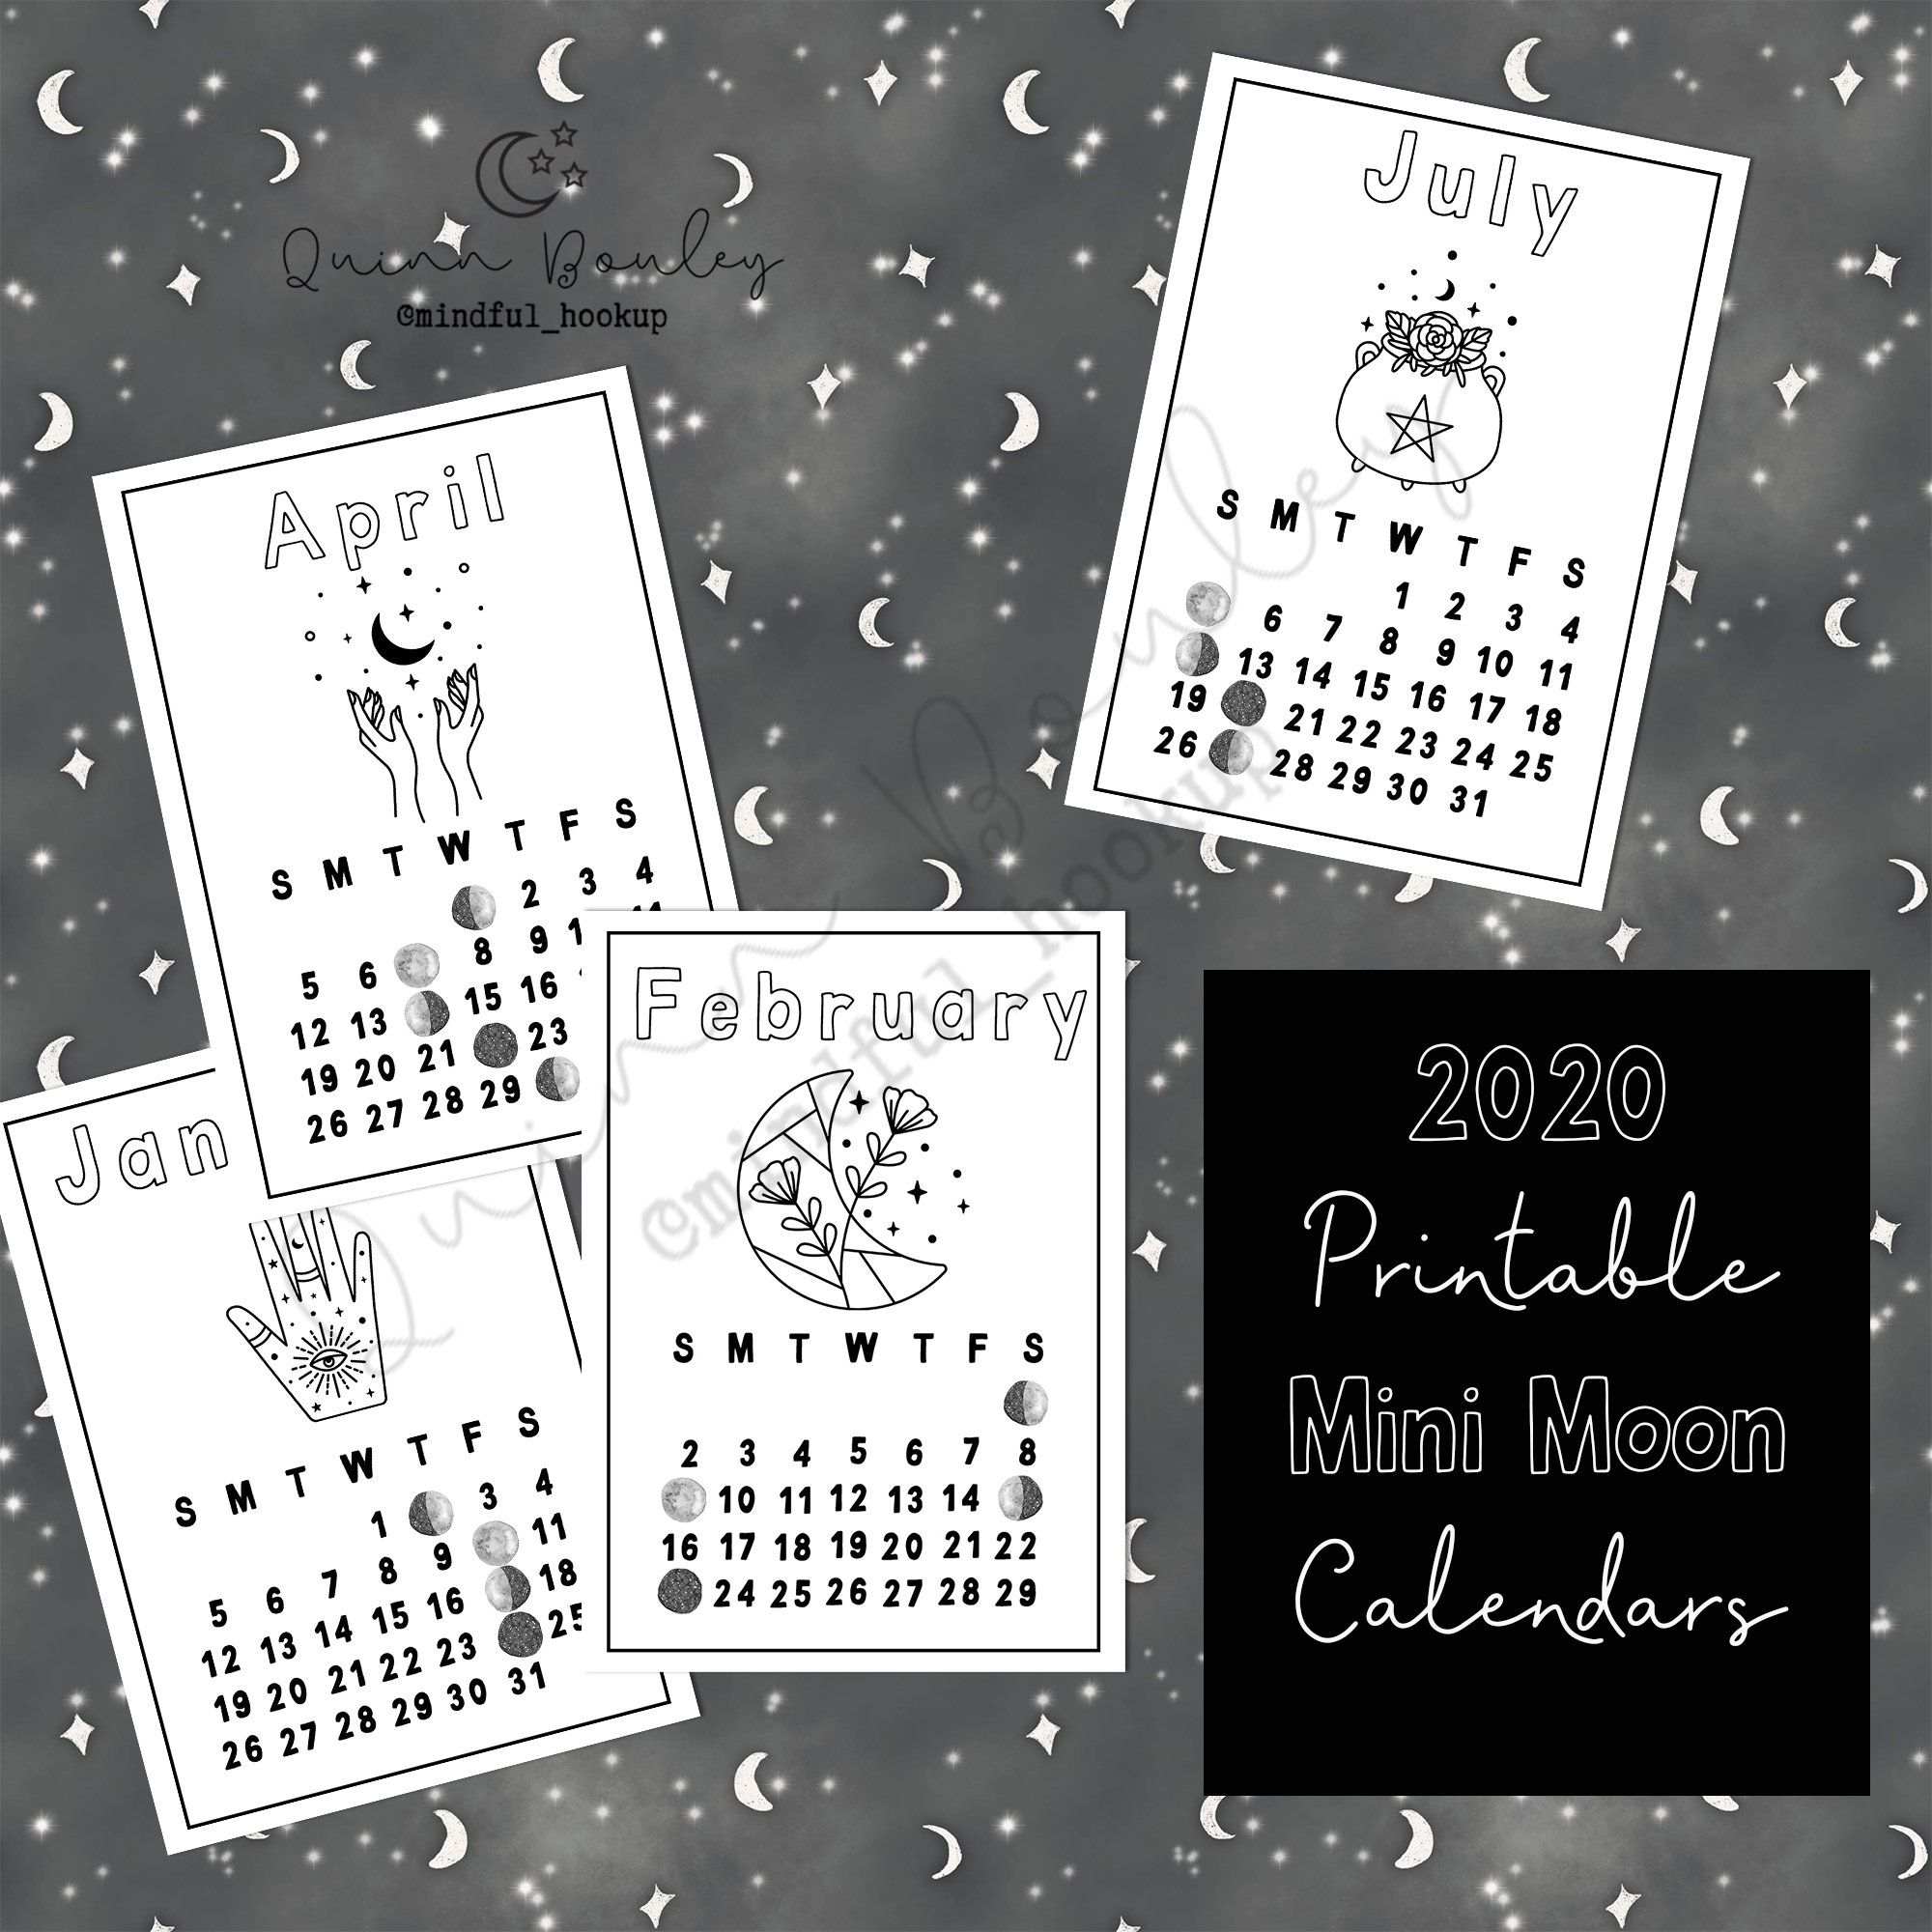 Mini Moon Calendars Printable